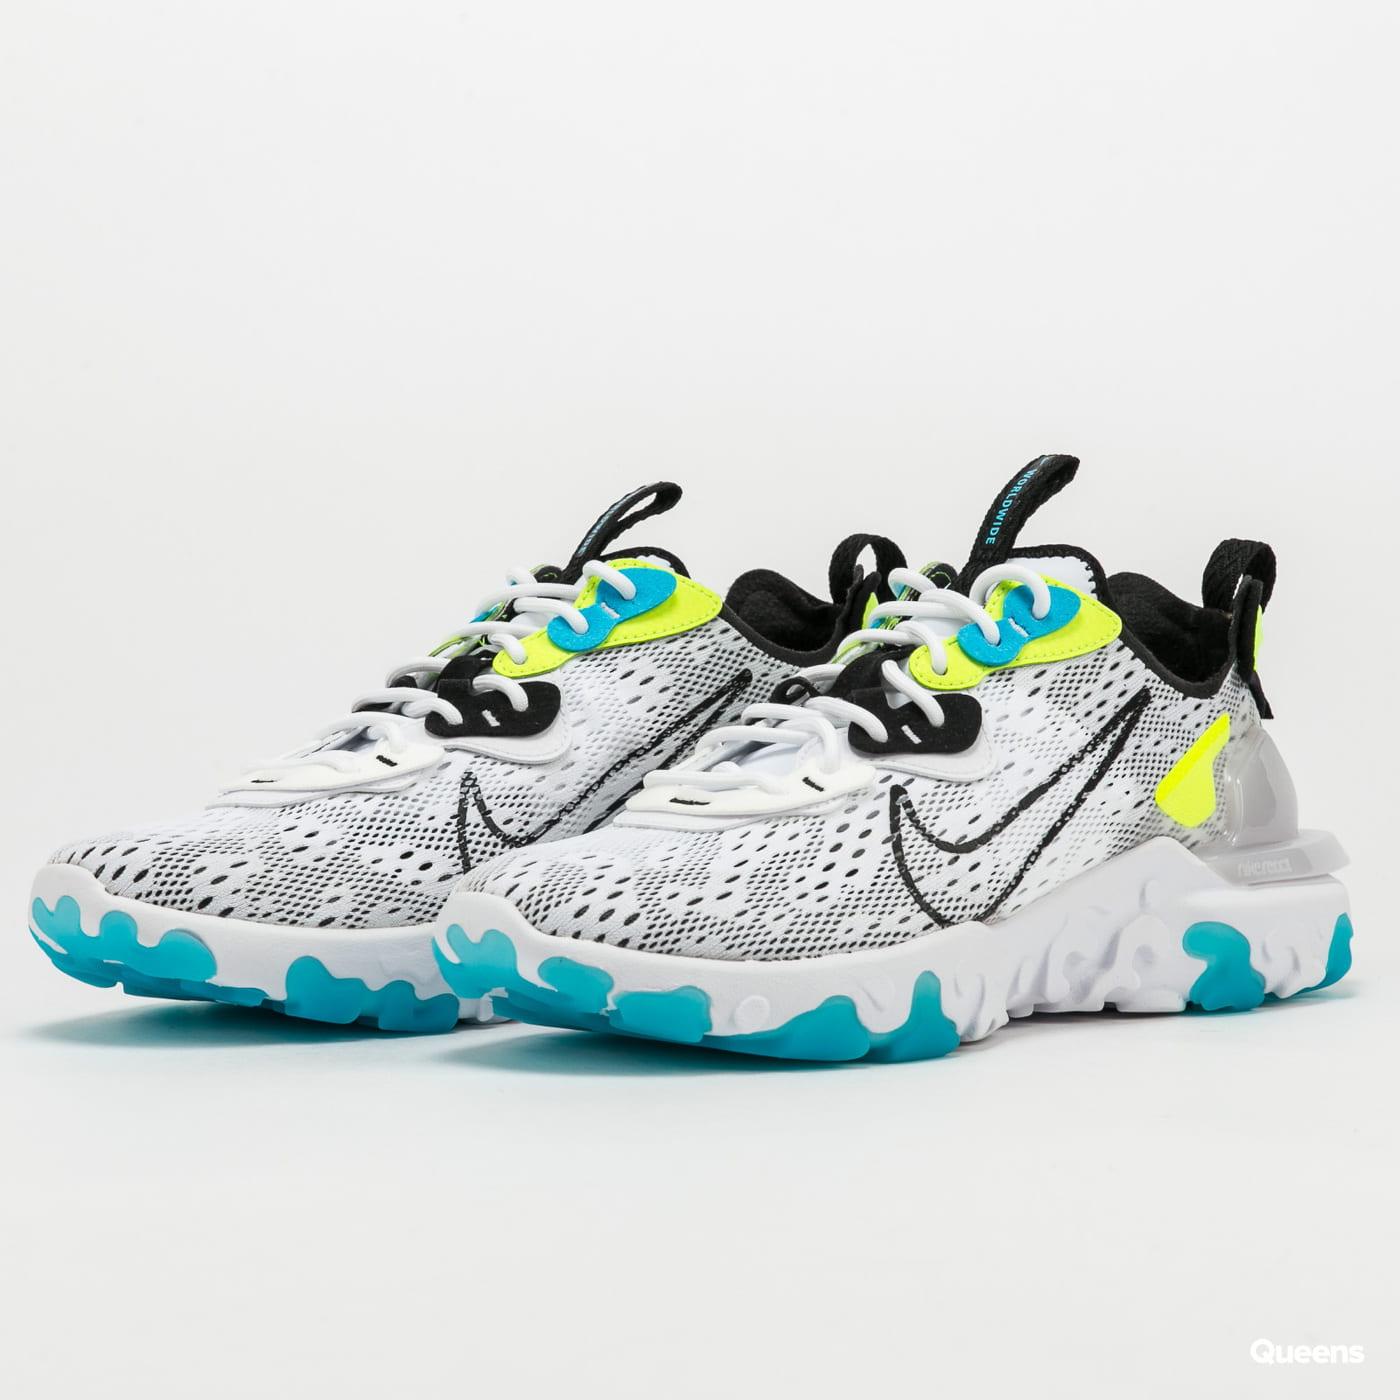 Sneakers Nike React Vision WW white / black - volt - blue fury ...